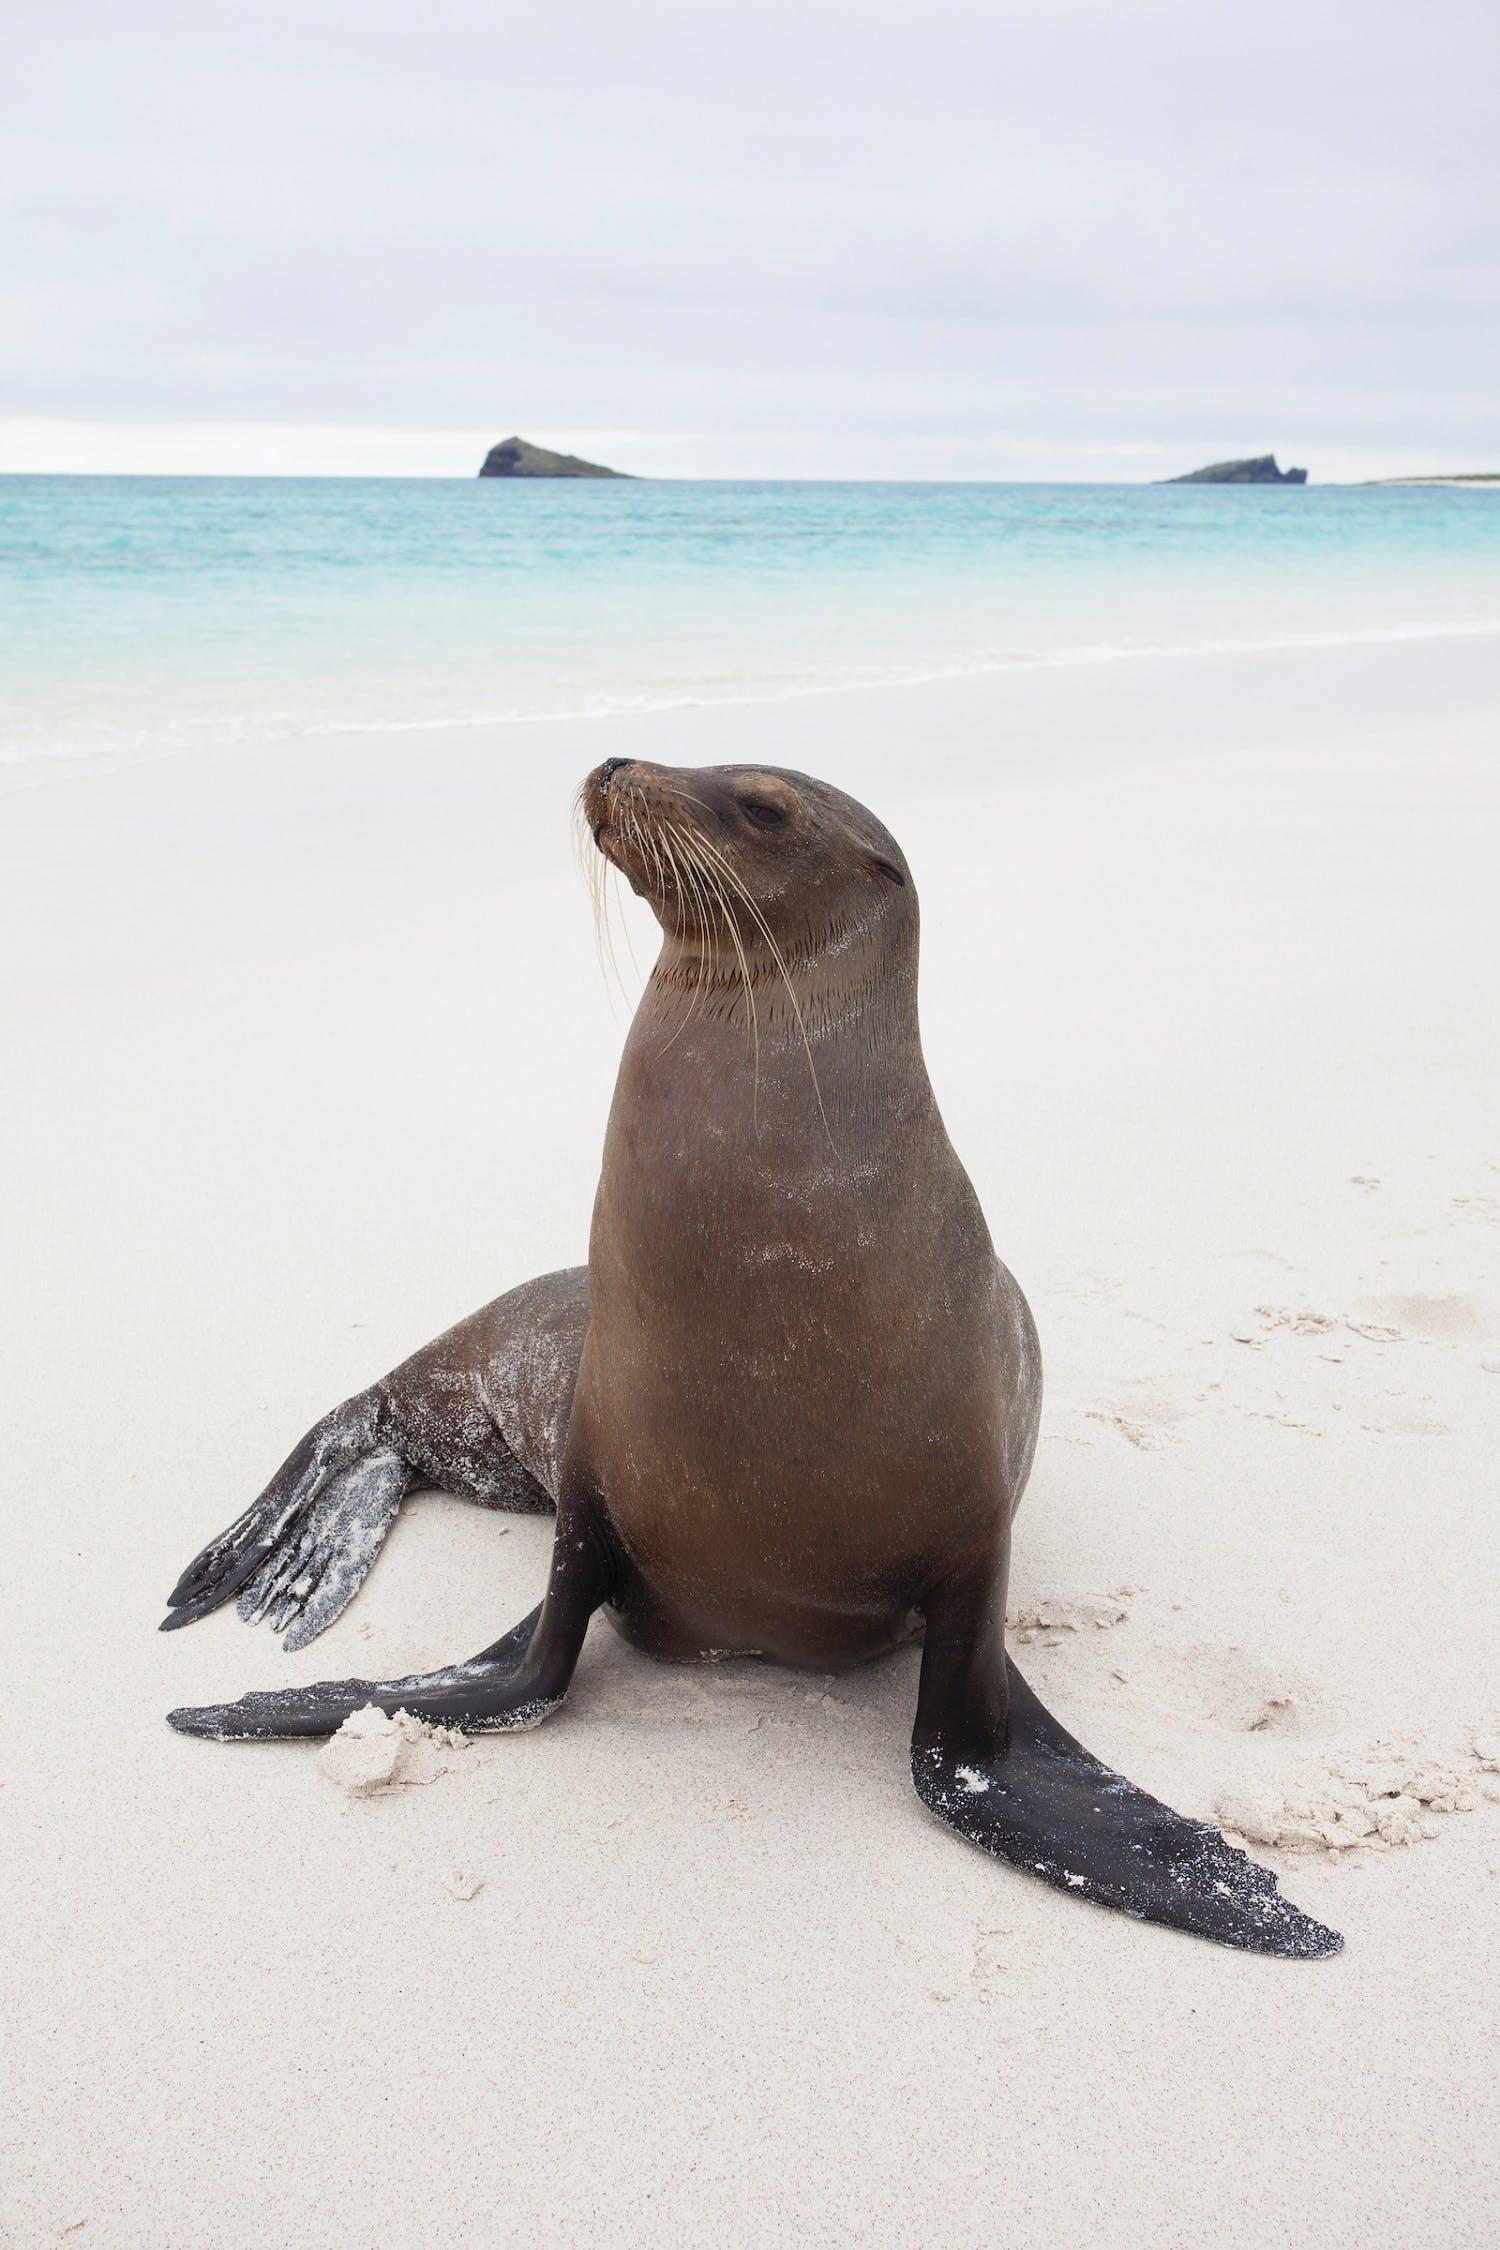 Galapagos sea lion - Wildlife in the Galapagos